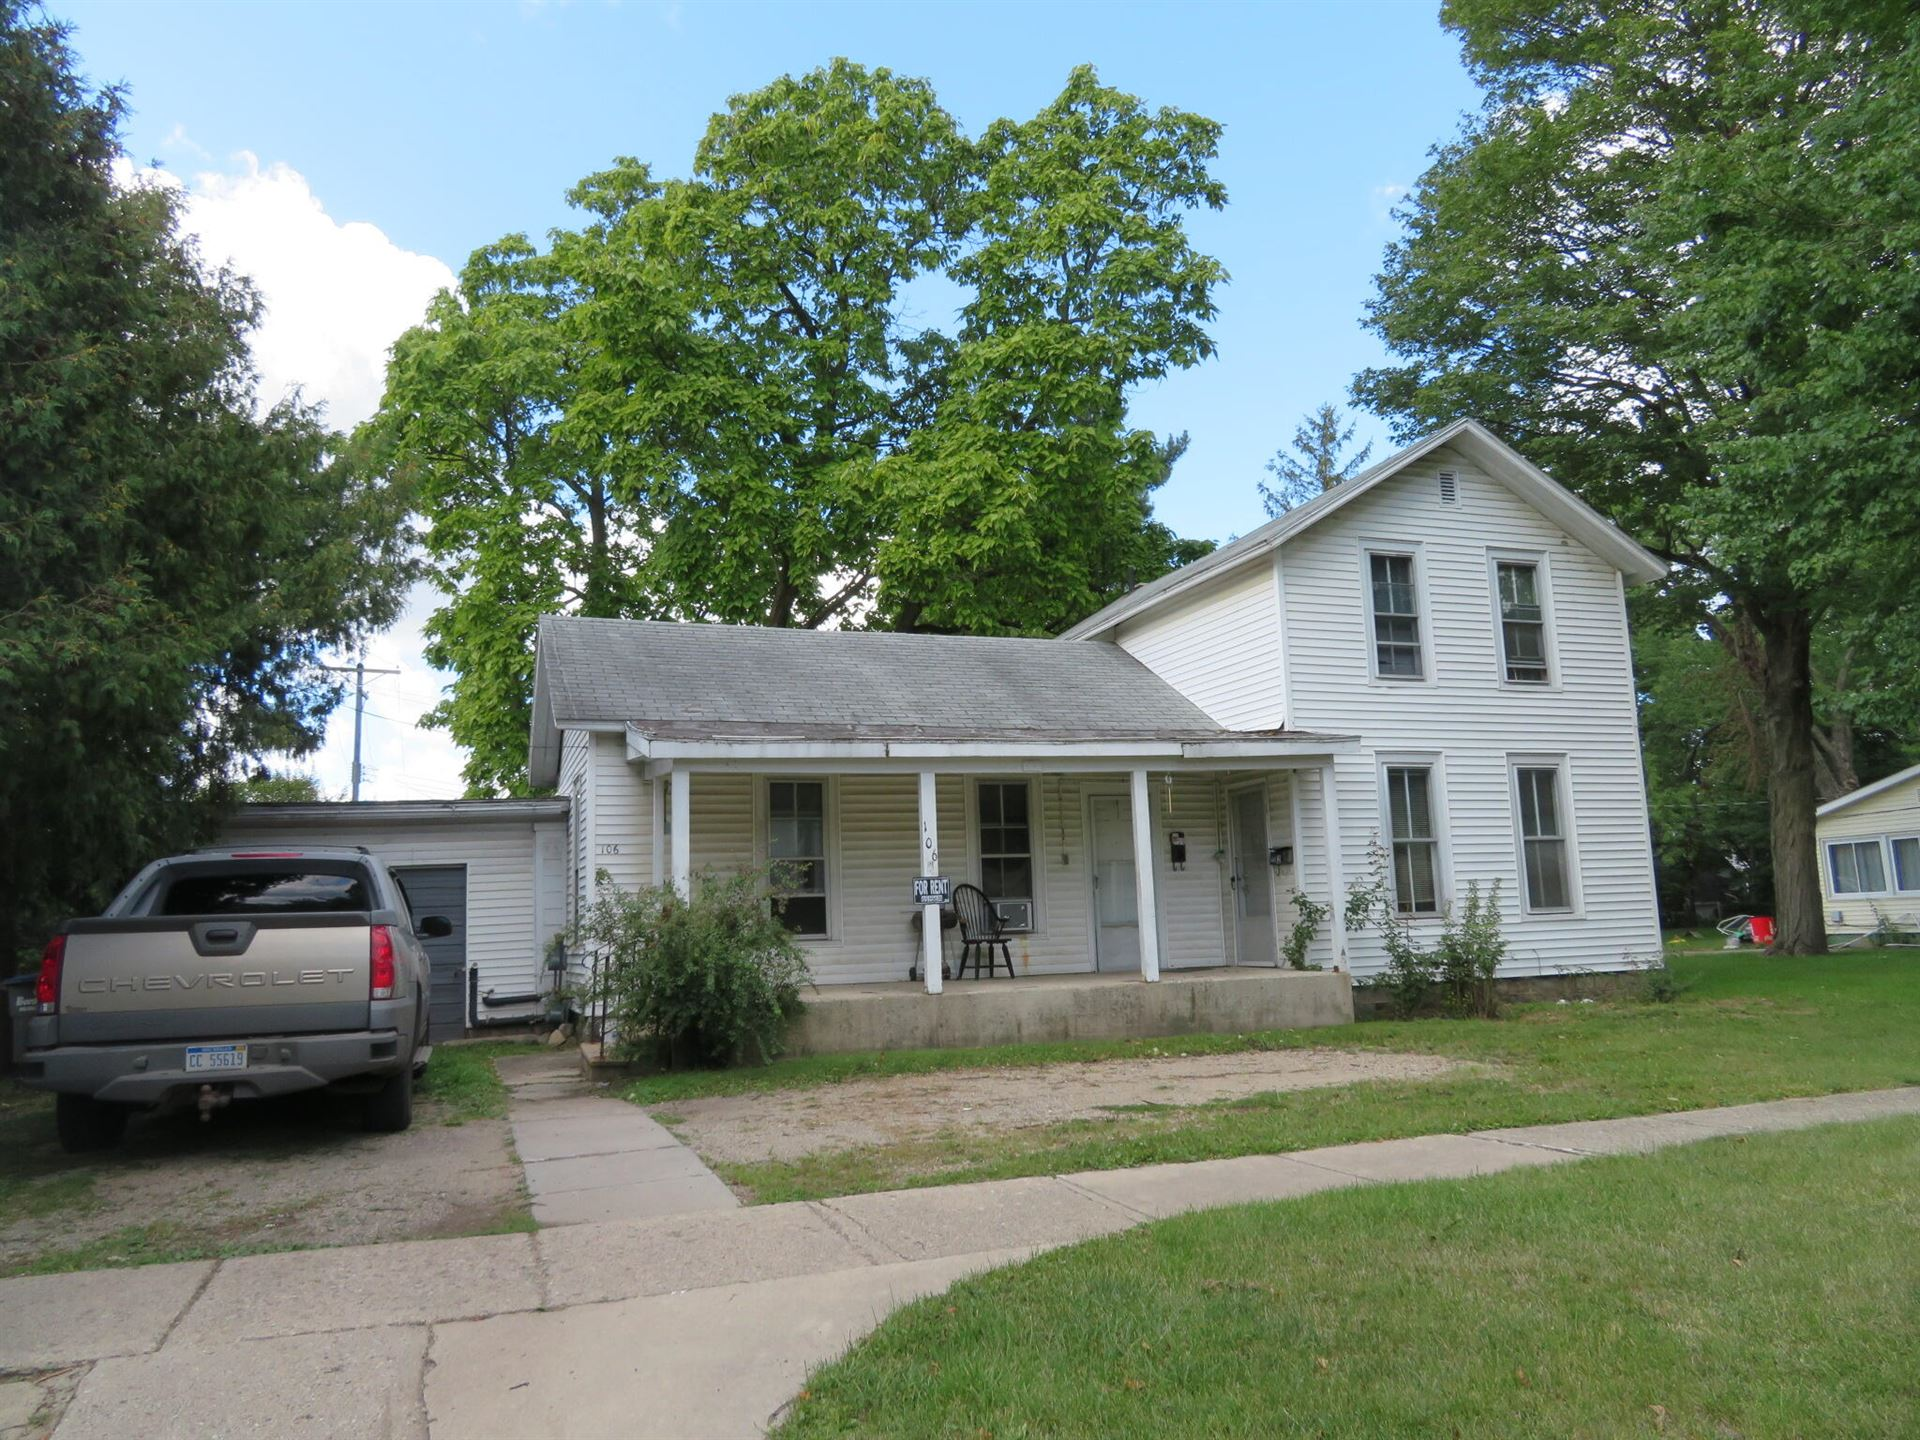 106 N Maple Street, Sturgis, MI 49091 - MLS#: 21107086